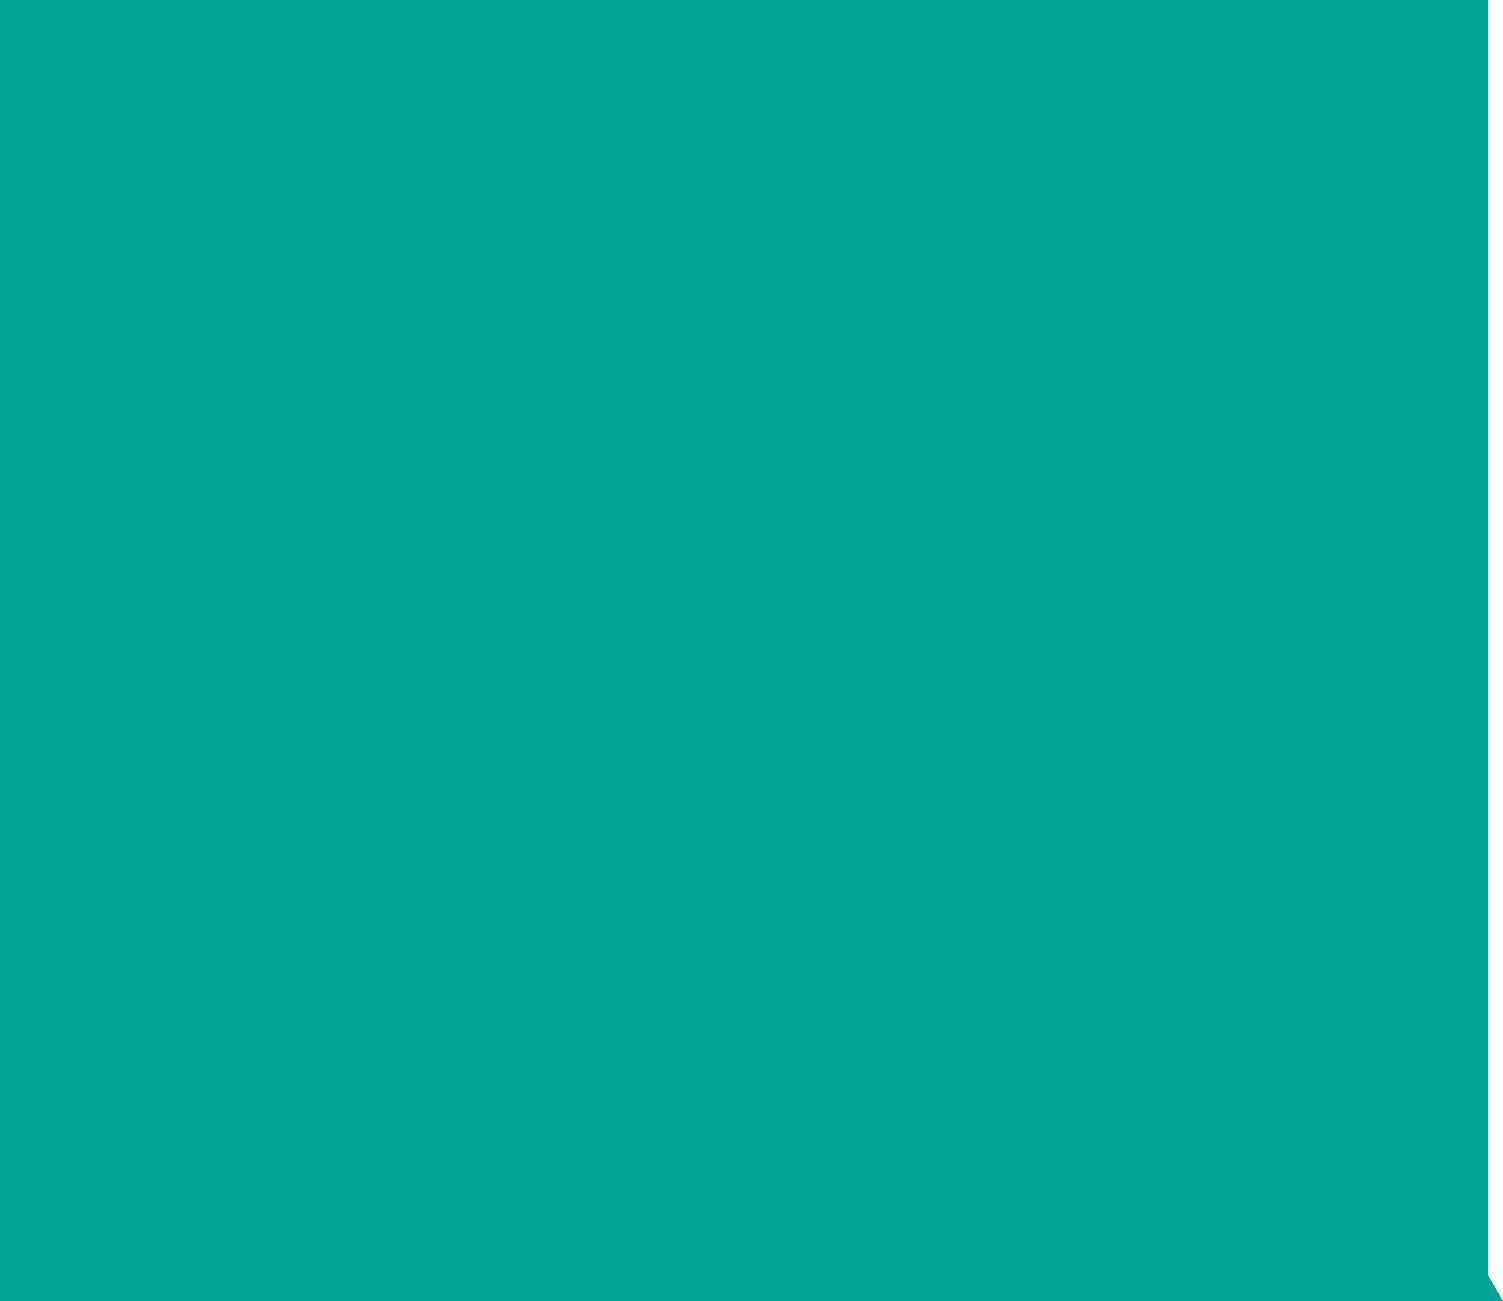 Jomar Logo5 Green